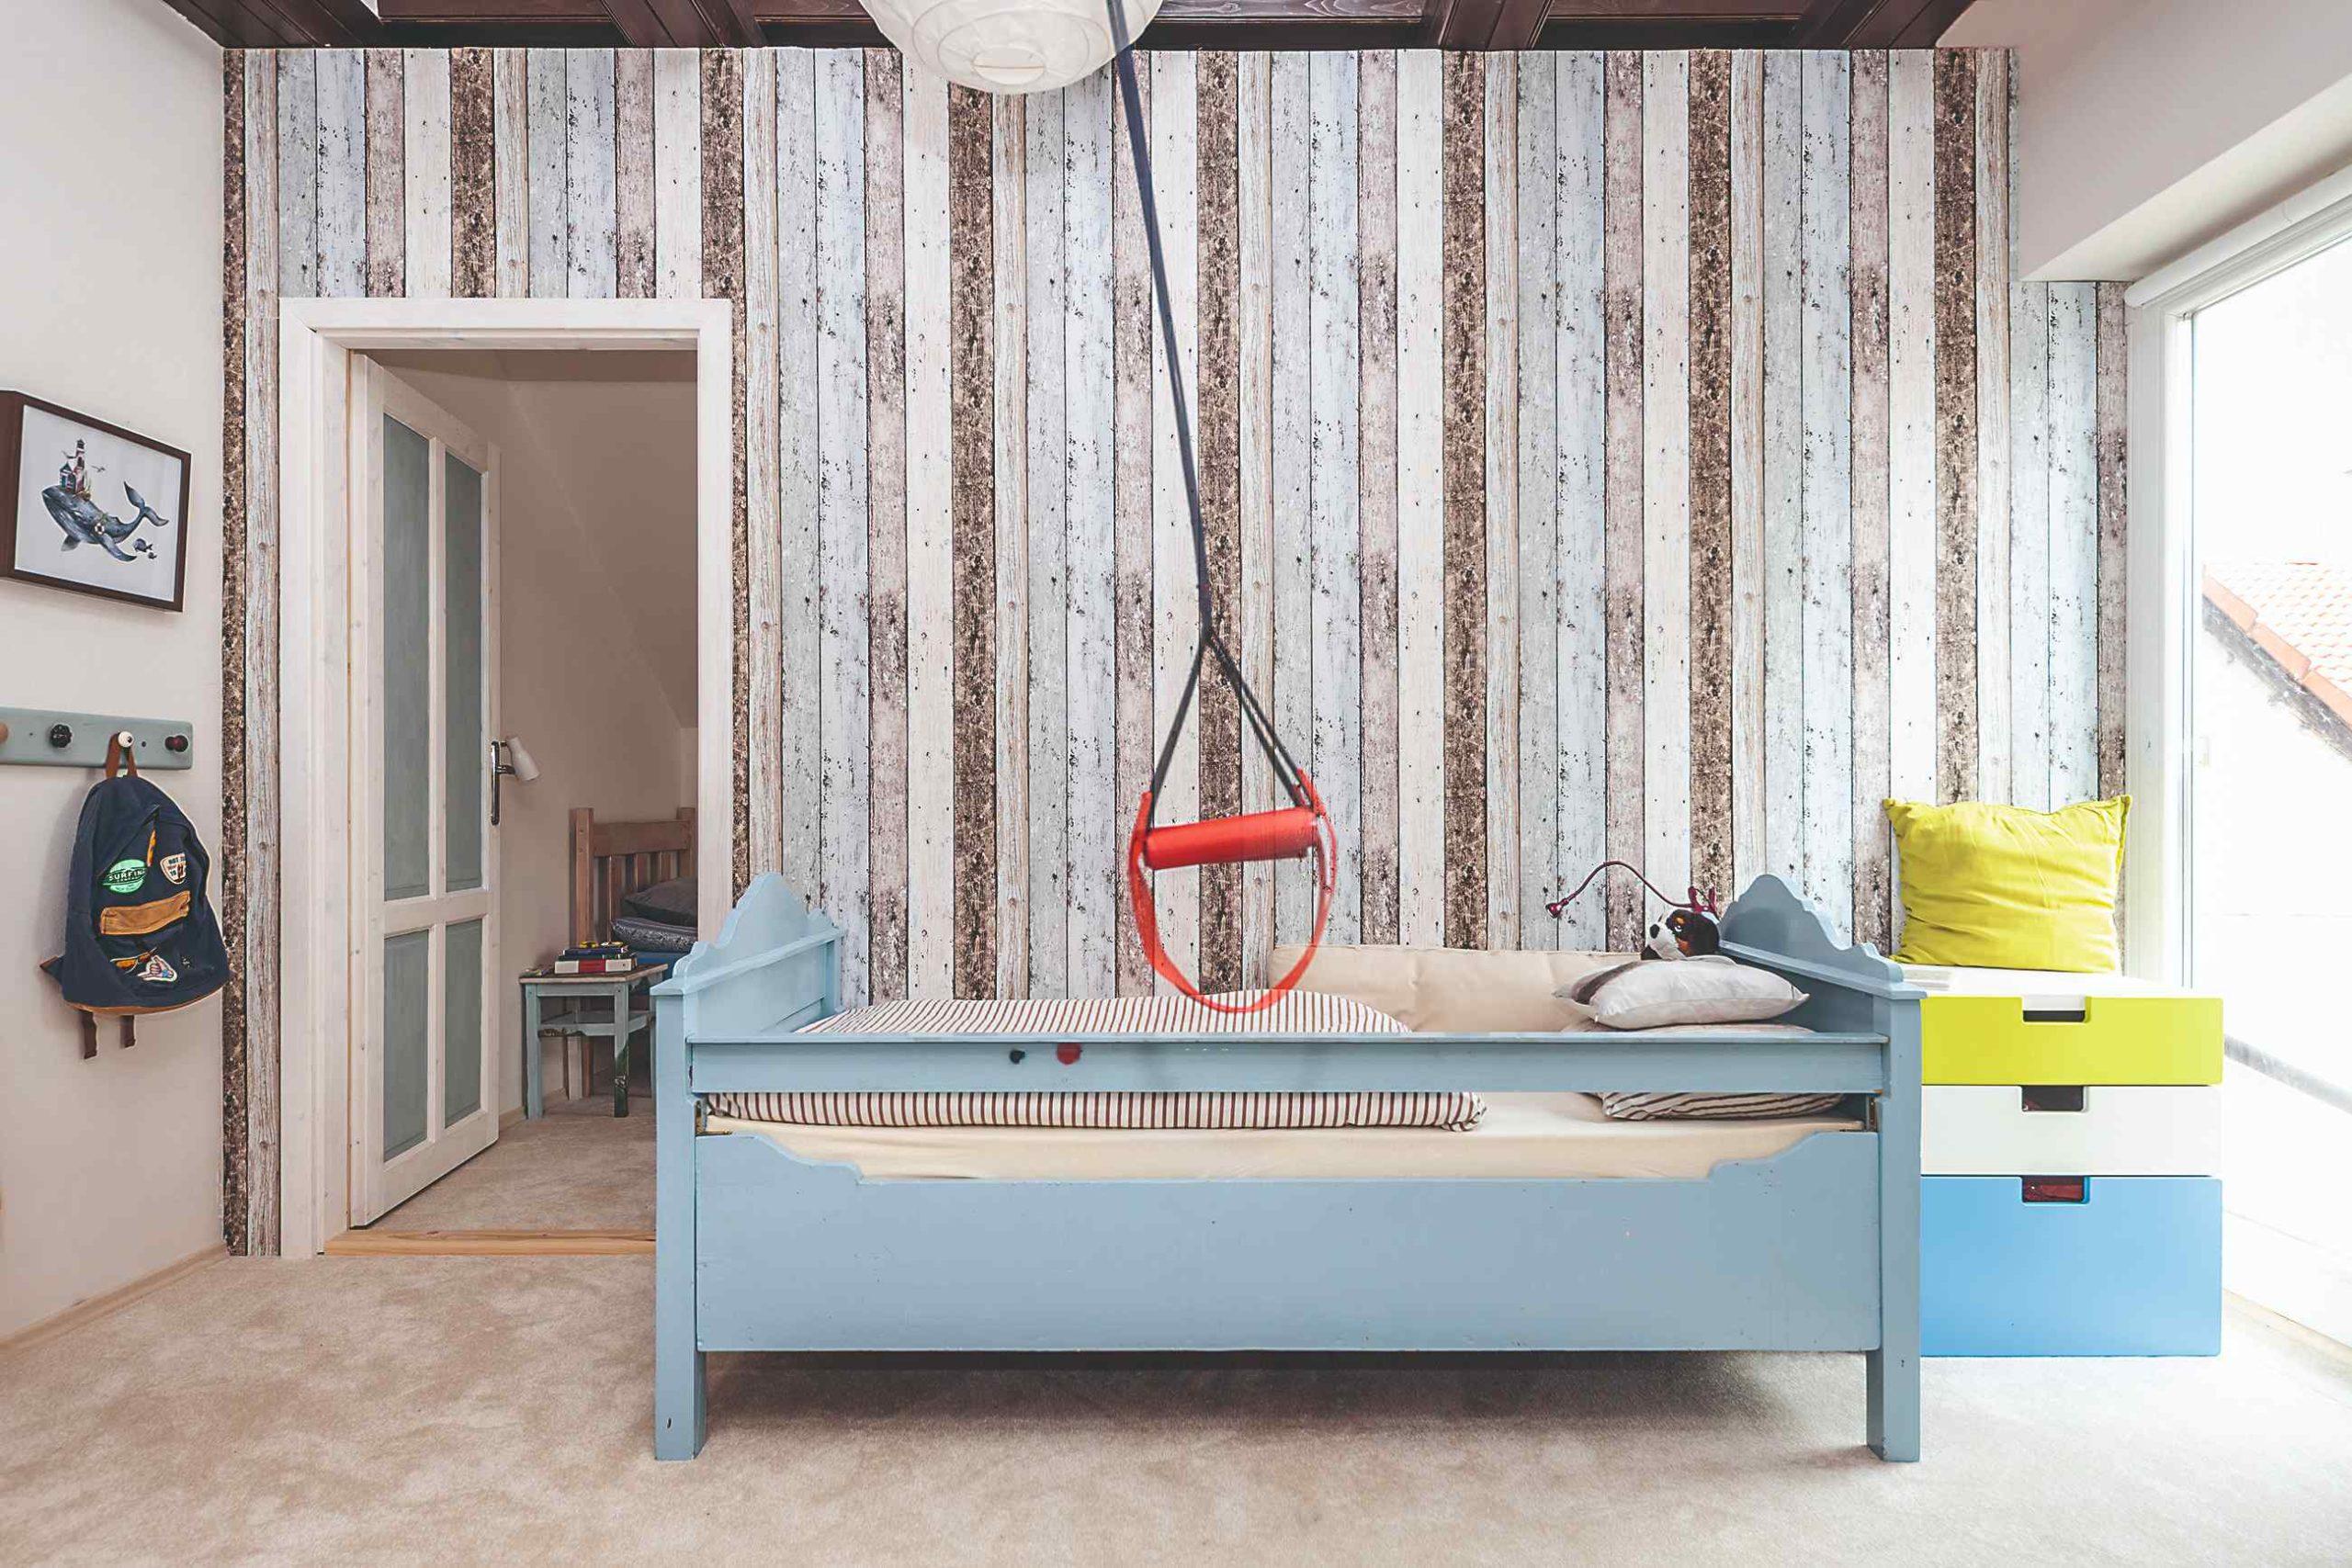 Dětský pokoj se vzorovanou tapetou a houpačkou